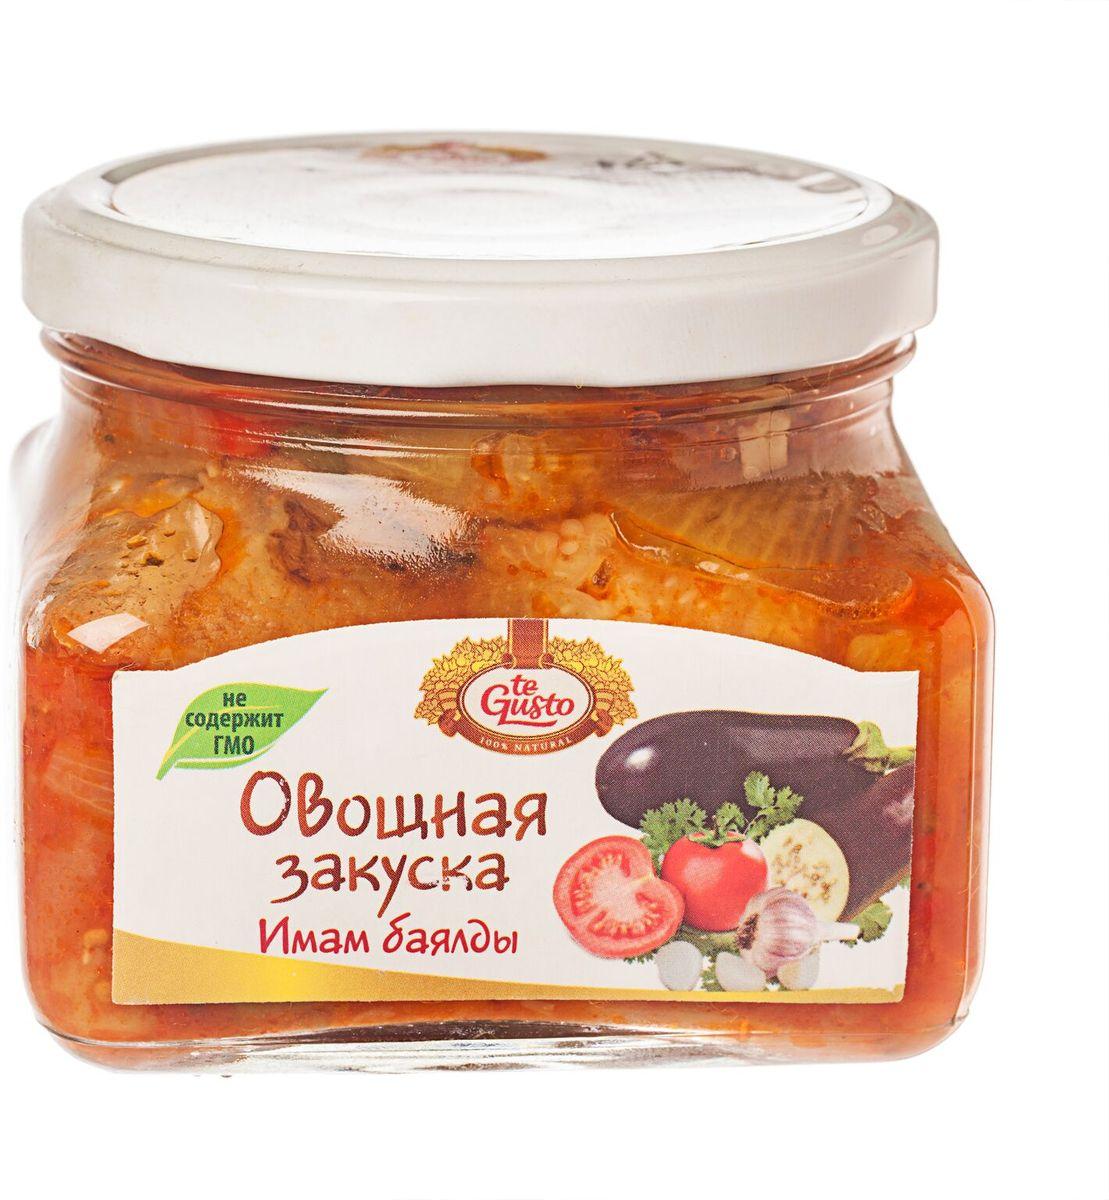 te Gusto Овощная закуска имам баялды, 340 г sababa баклажаны гриль рецепт по русски 300 г